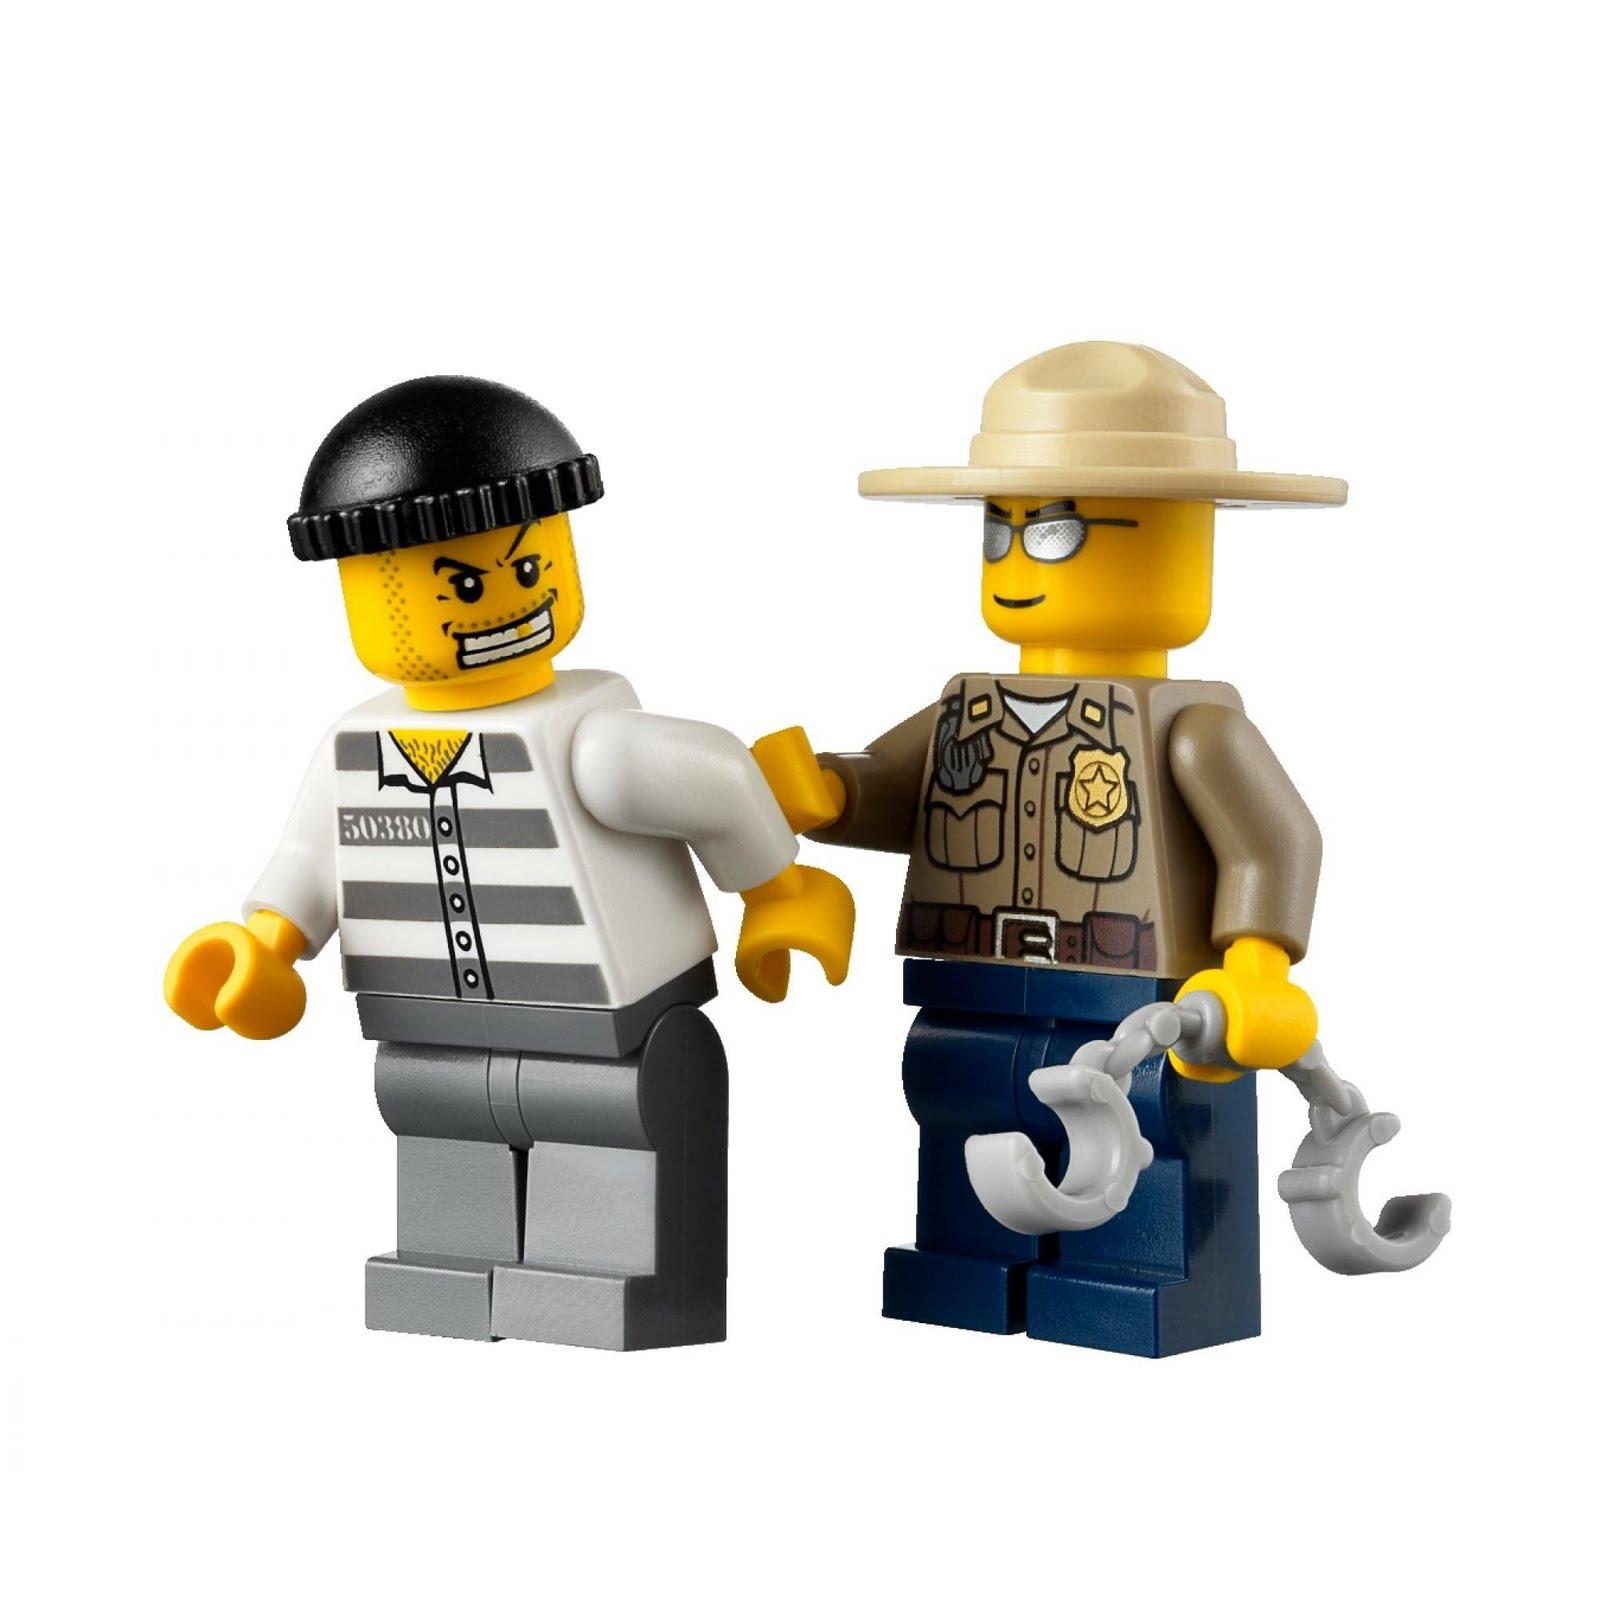 REPUBbLICk: set database: LEGO 4436 patrol car